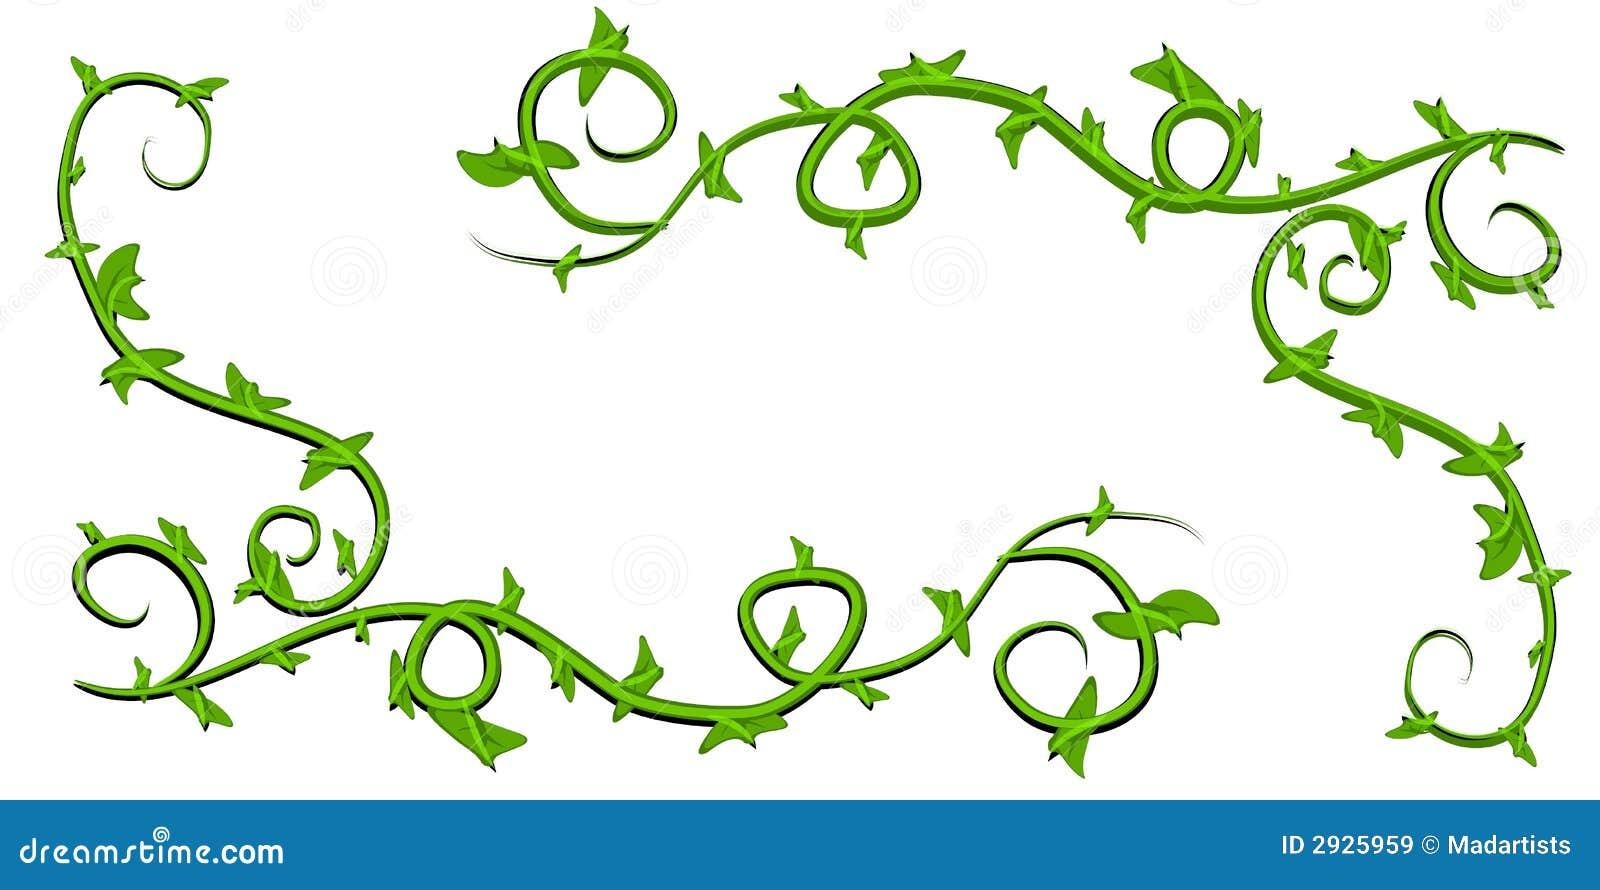 green leafy vines clip art stock illustration illustration of rh dreamstime com vine clipart png vine clipart border